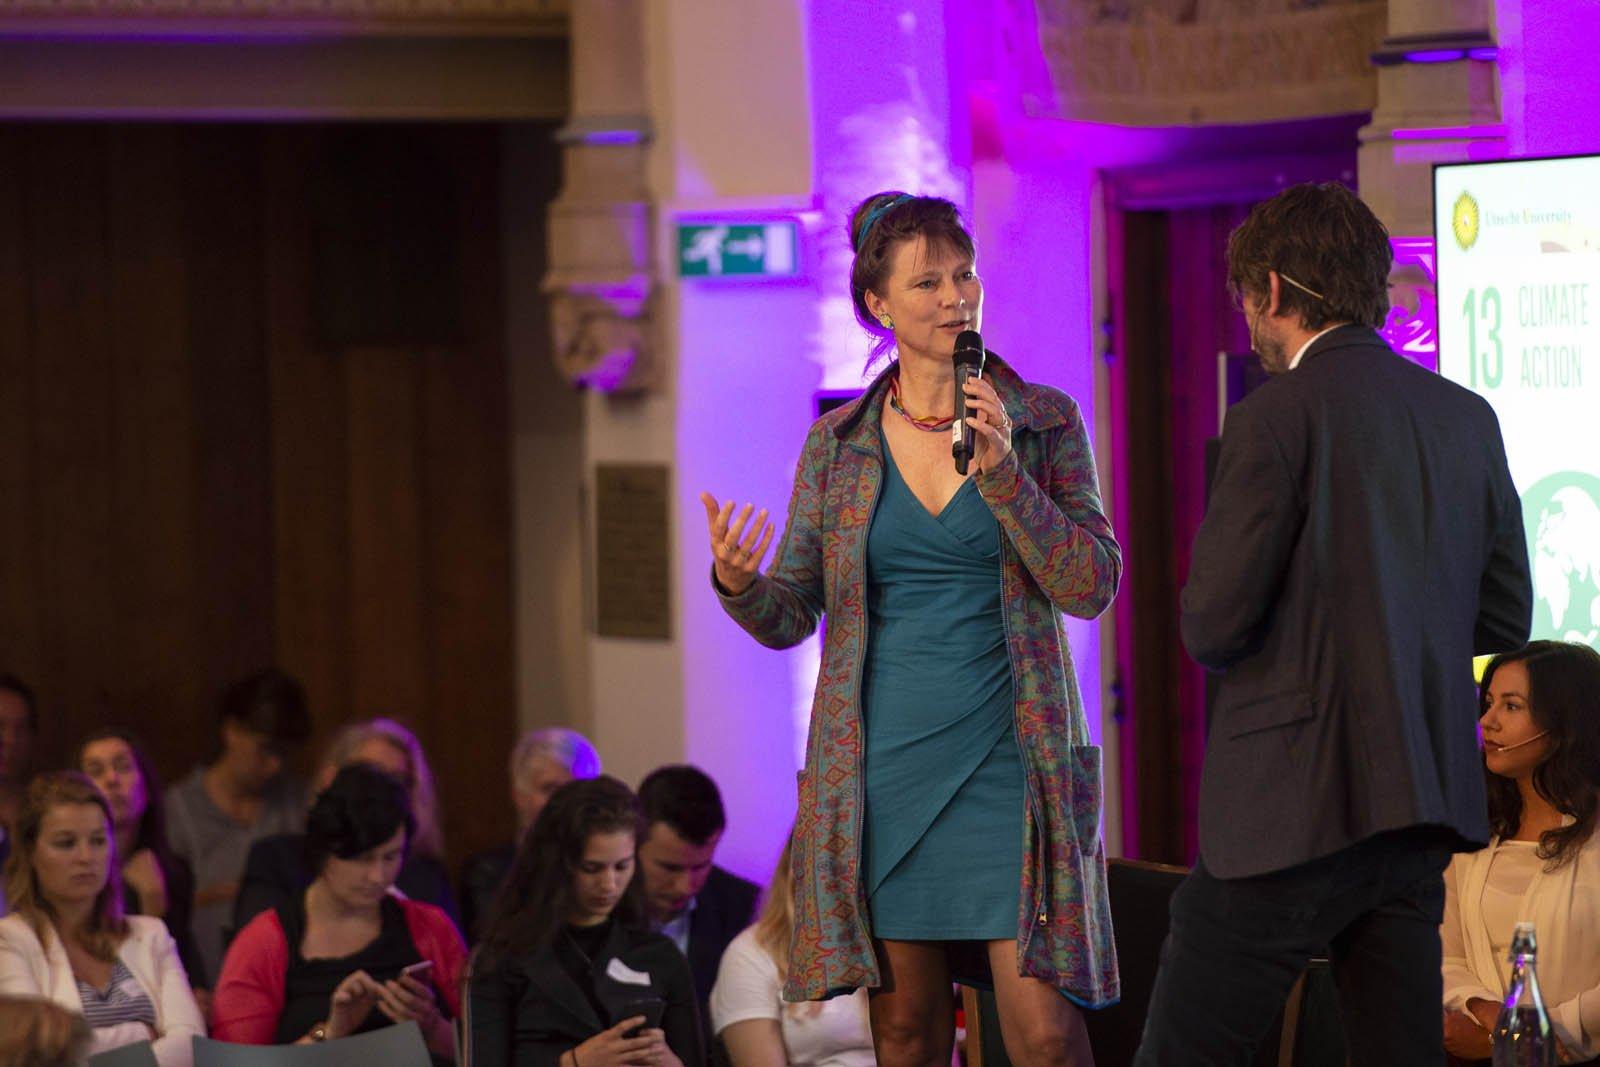 Marjan Minnesma, milieu-activiste en directeur van Stichting Urgenda spreekt tijdens het Social Entrepreneurship Festival 2018